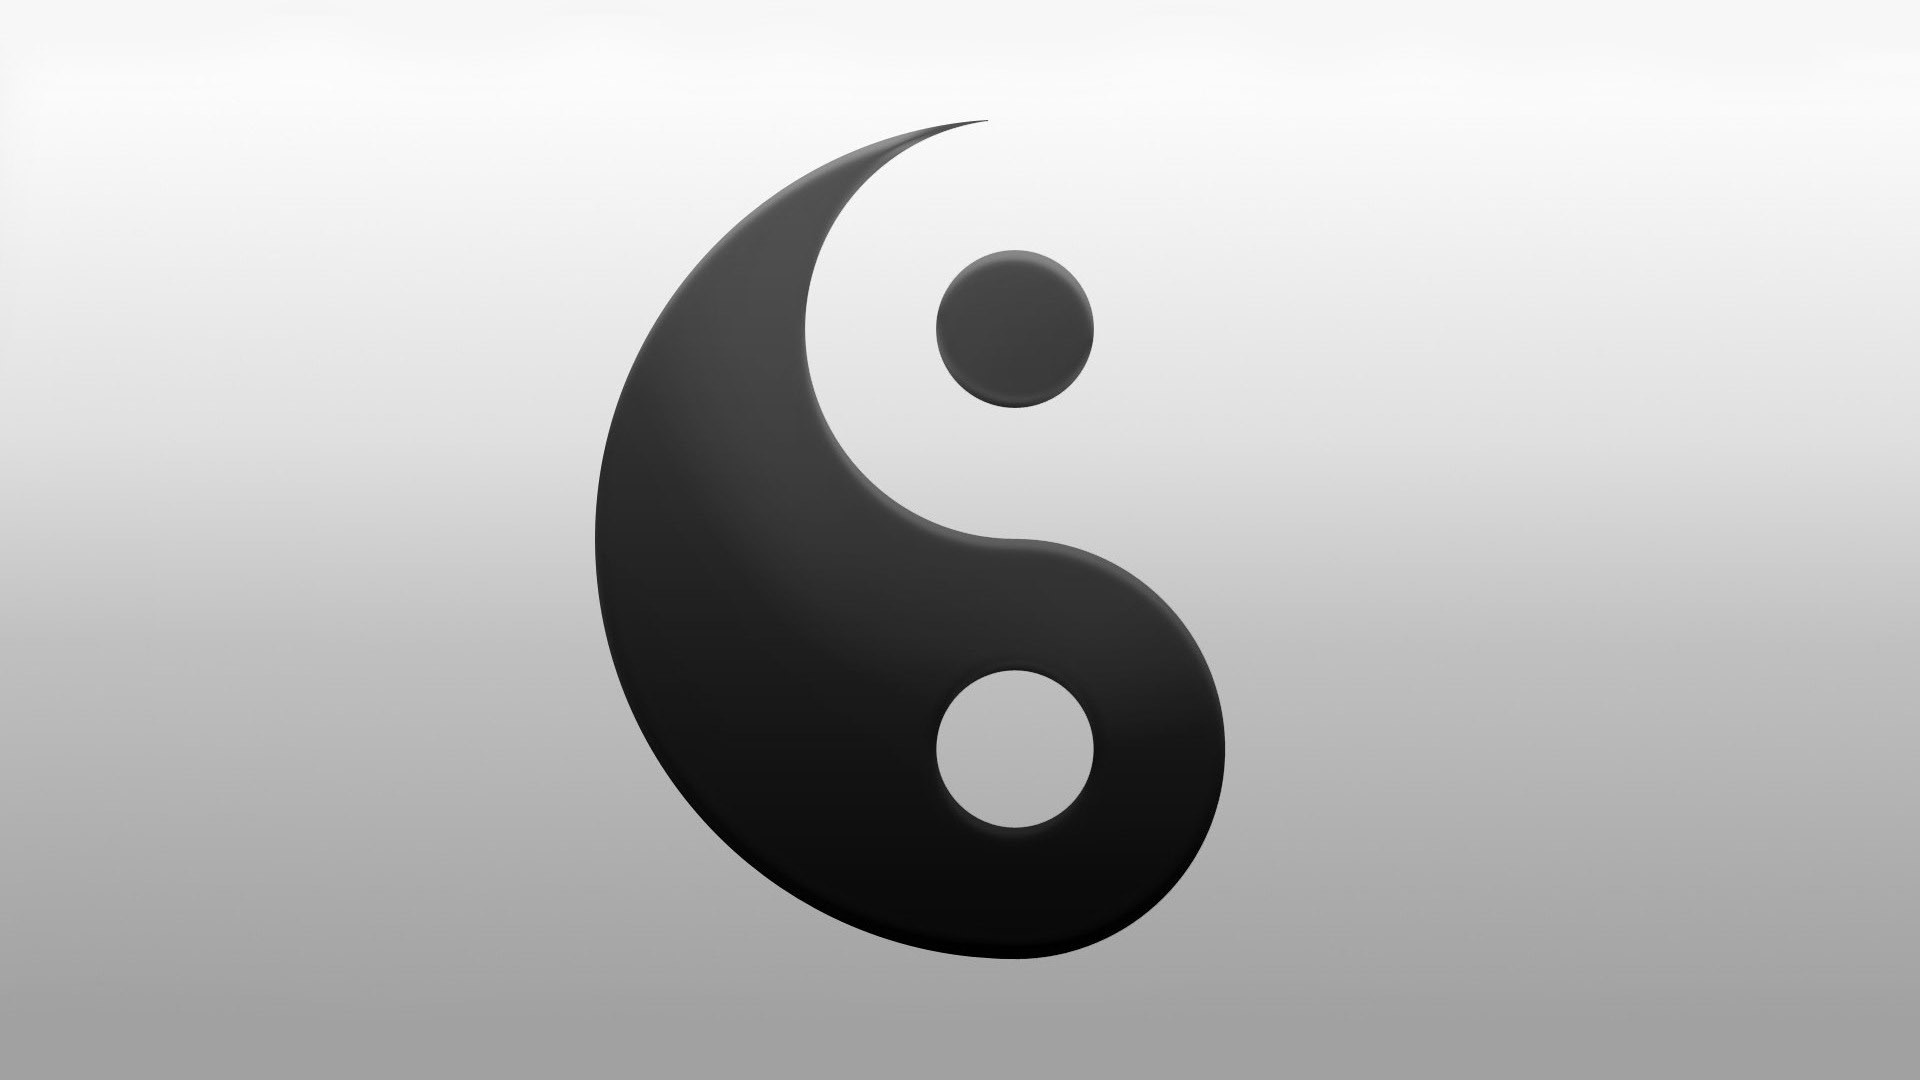 Yin Yang Full HD Wallpaper